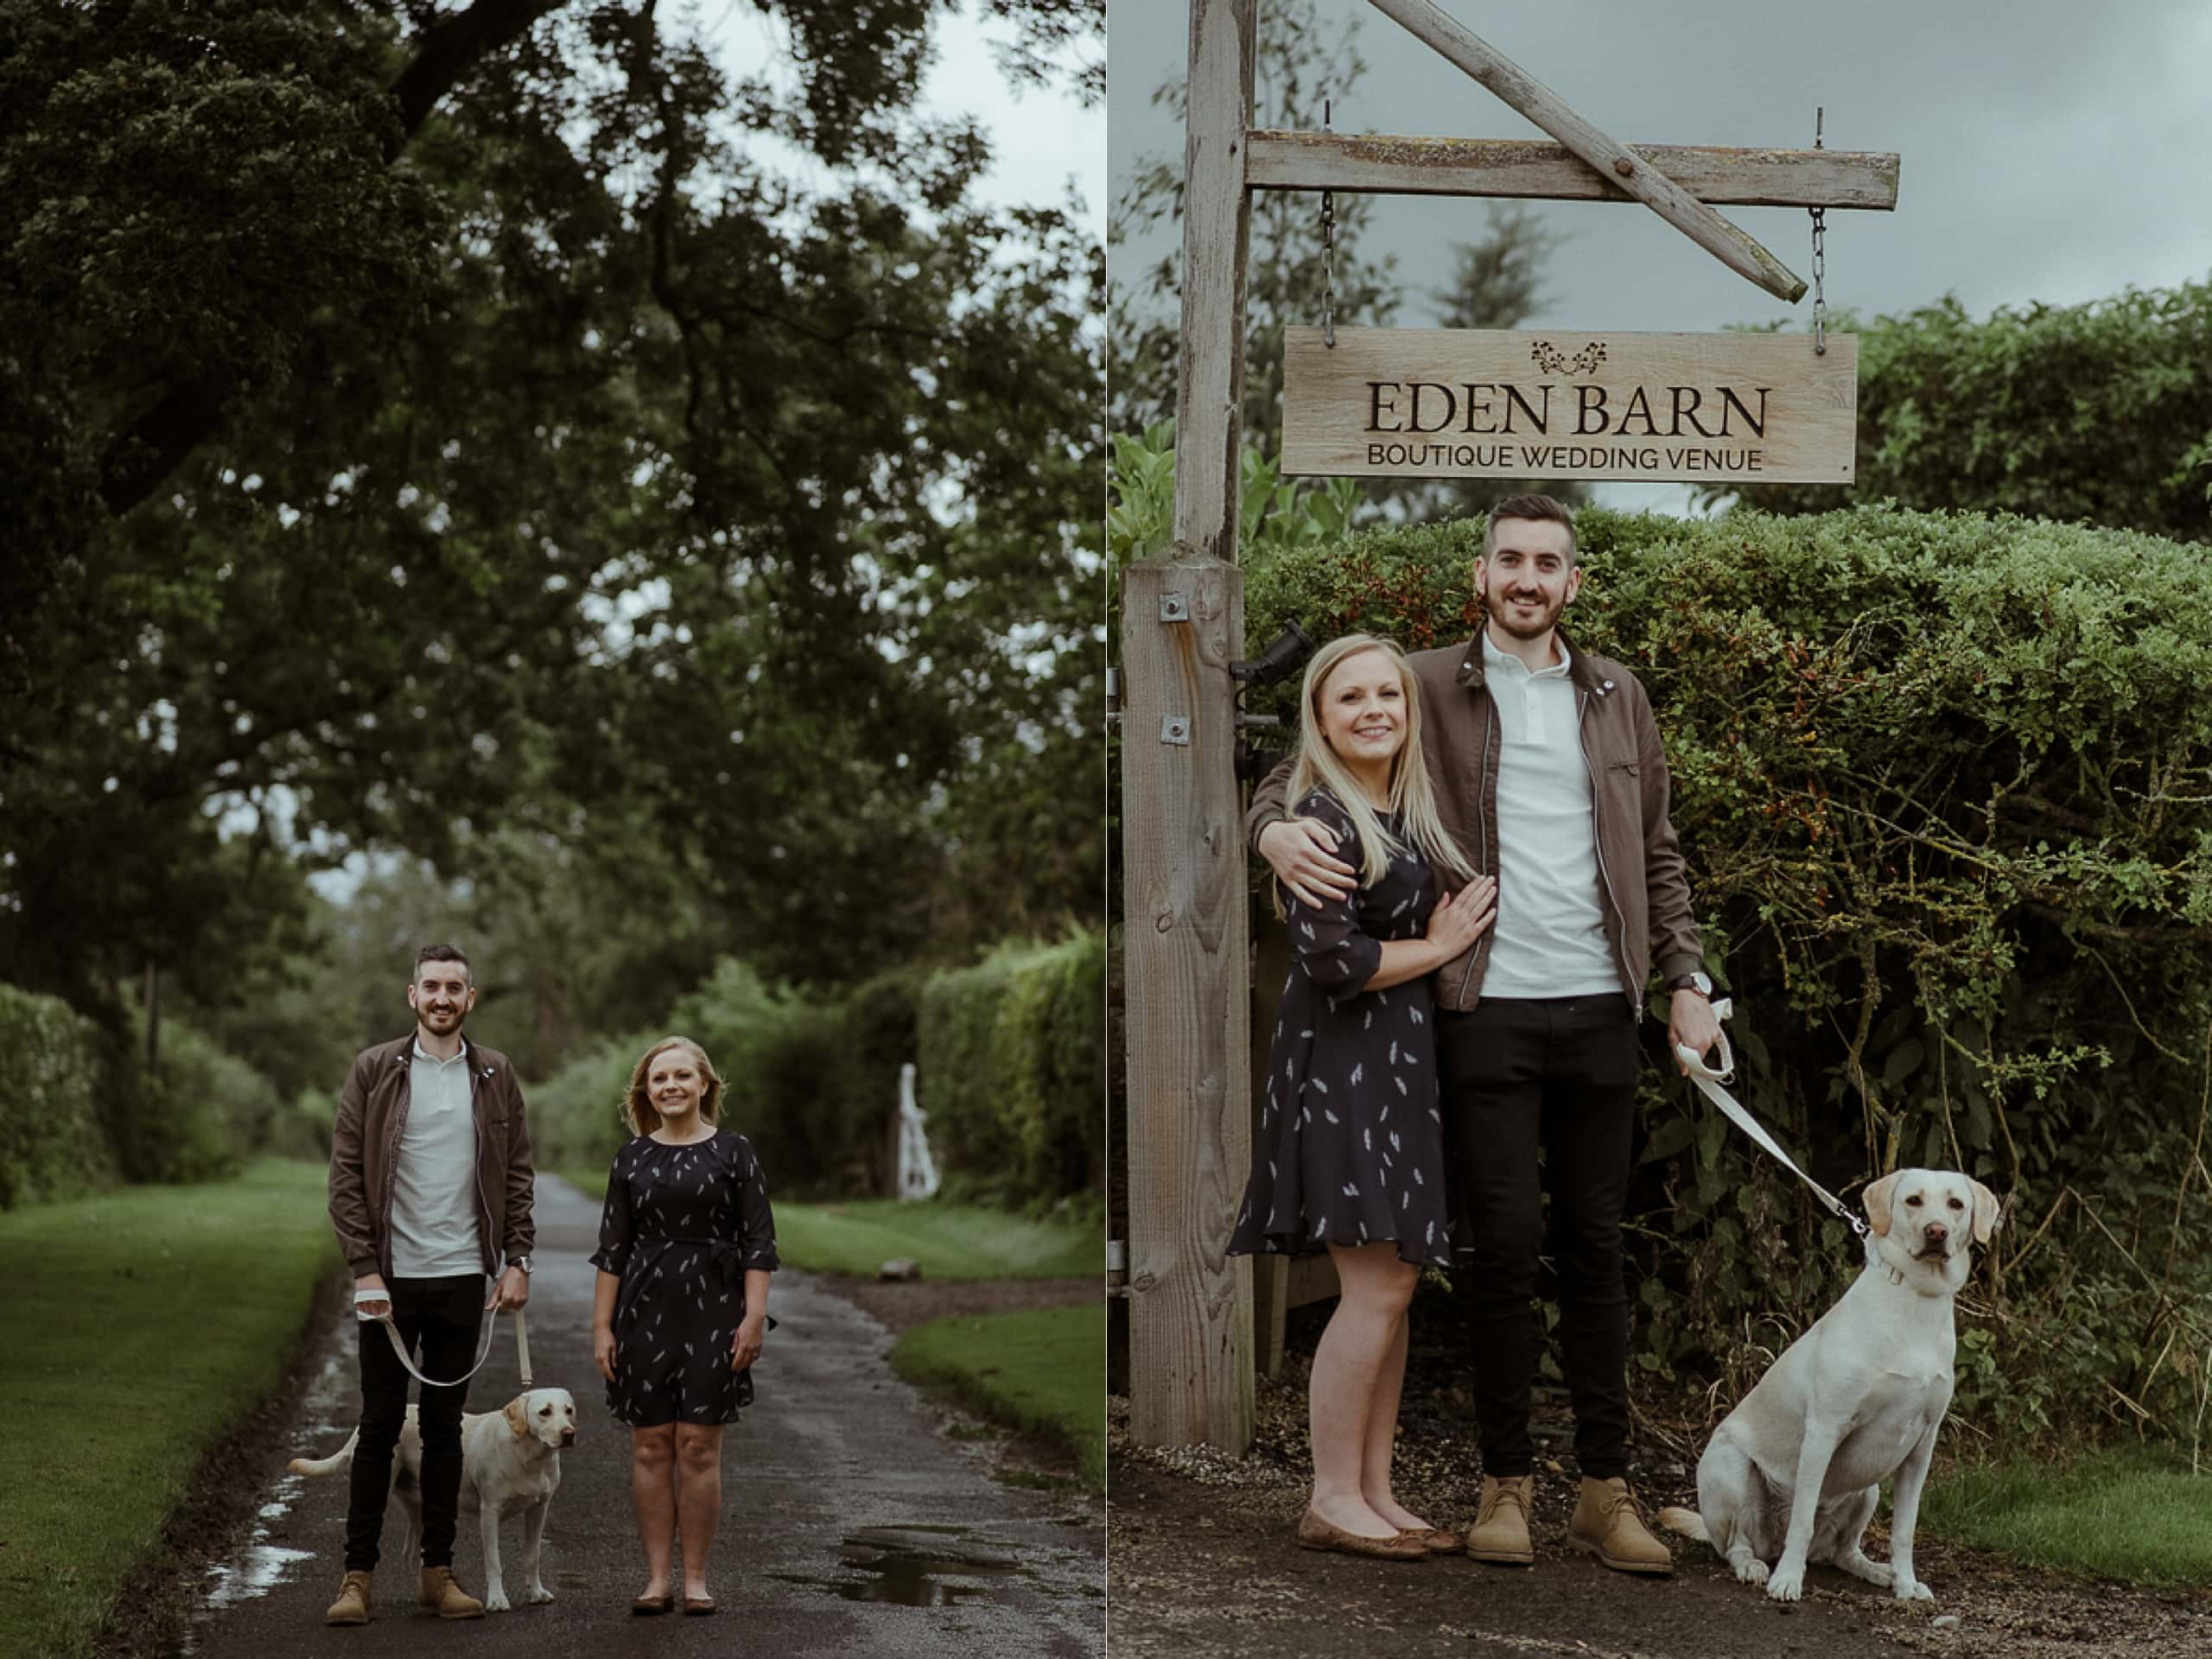 Couple Outside Eden Barn Wedding Venue